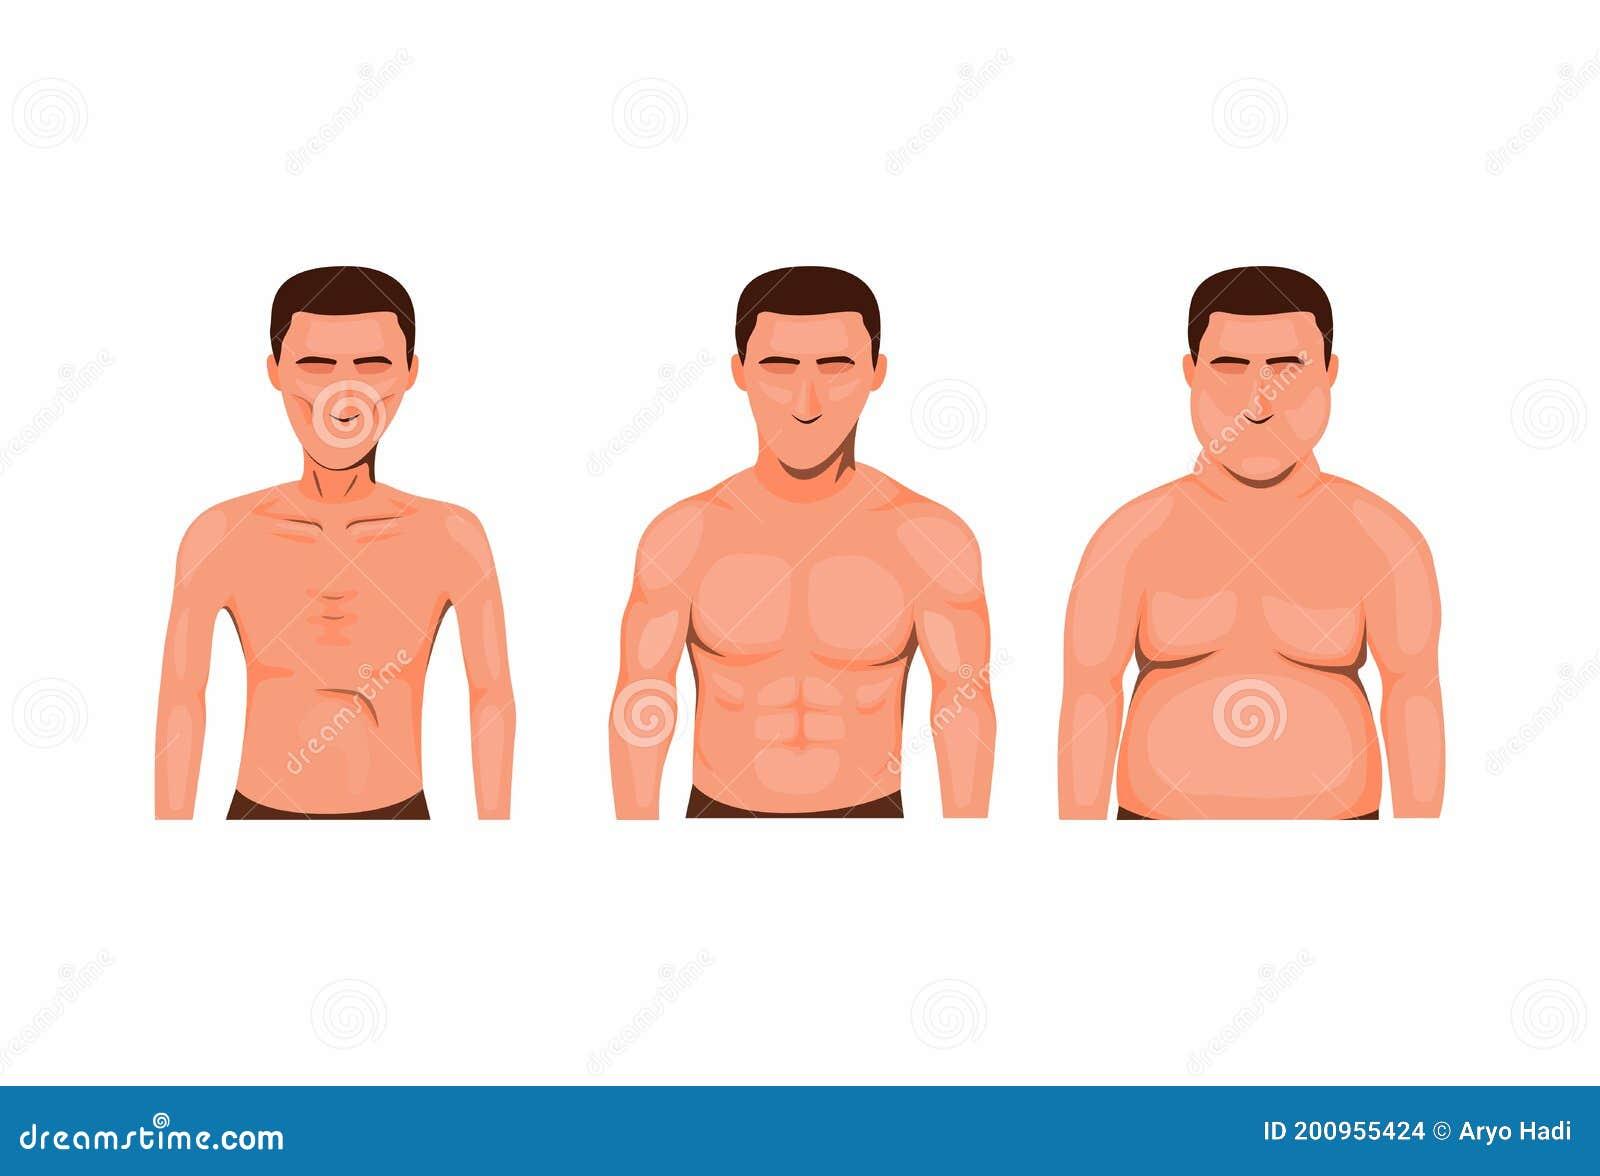 Men skinny fat How to